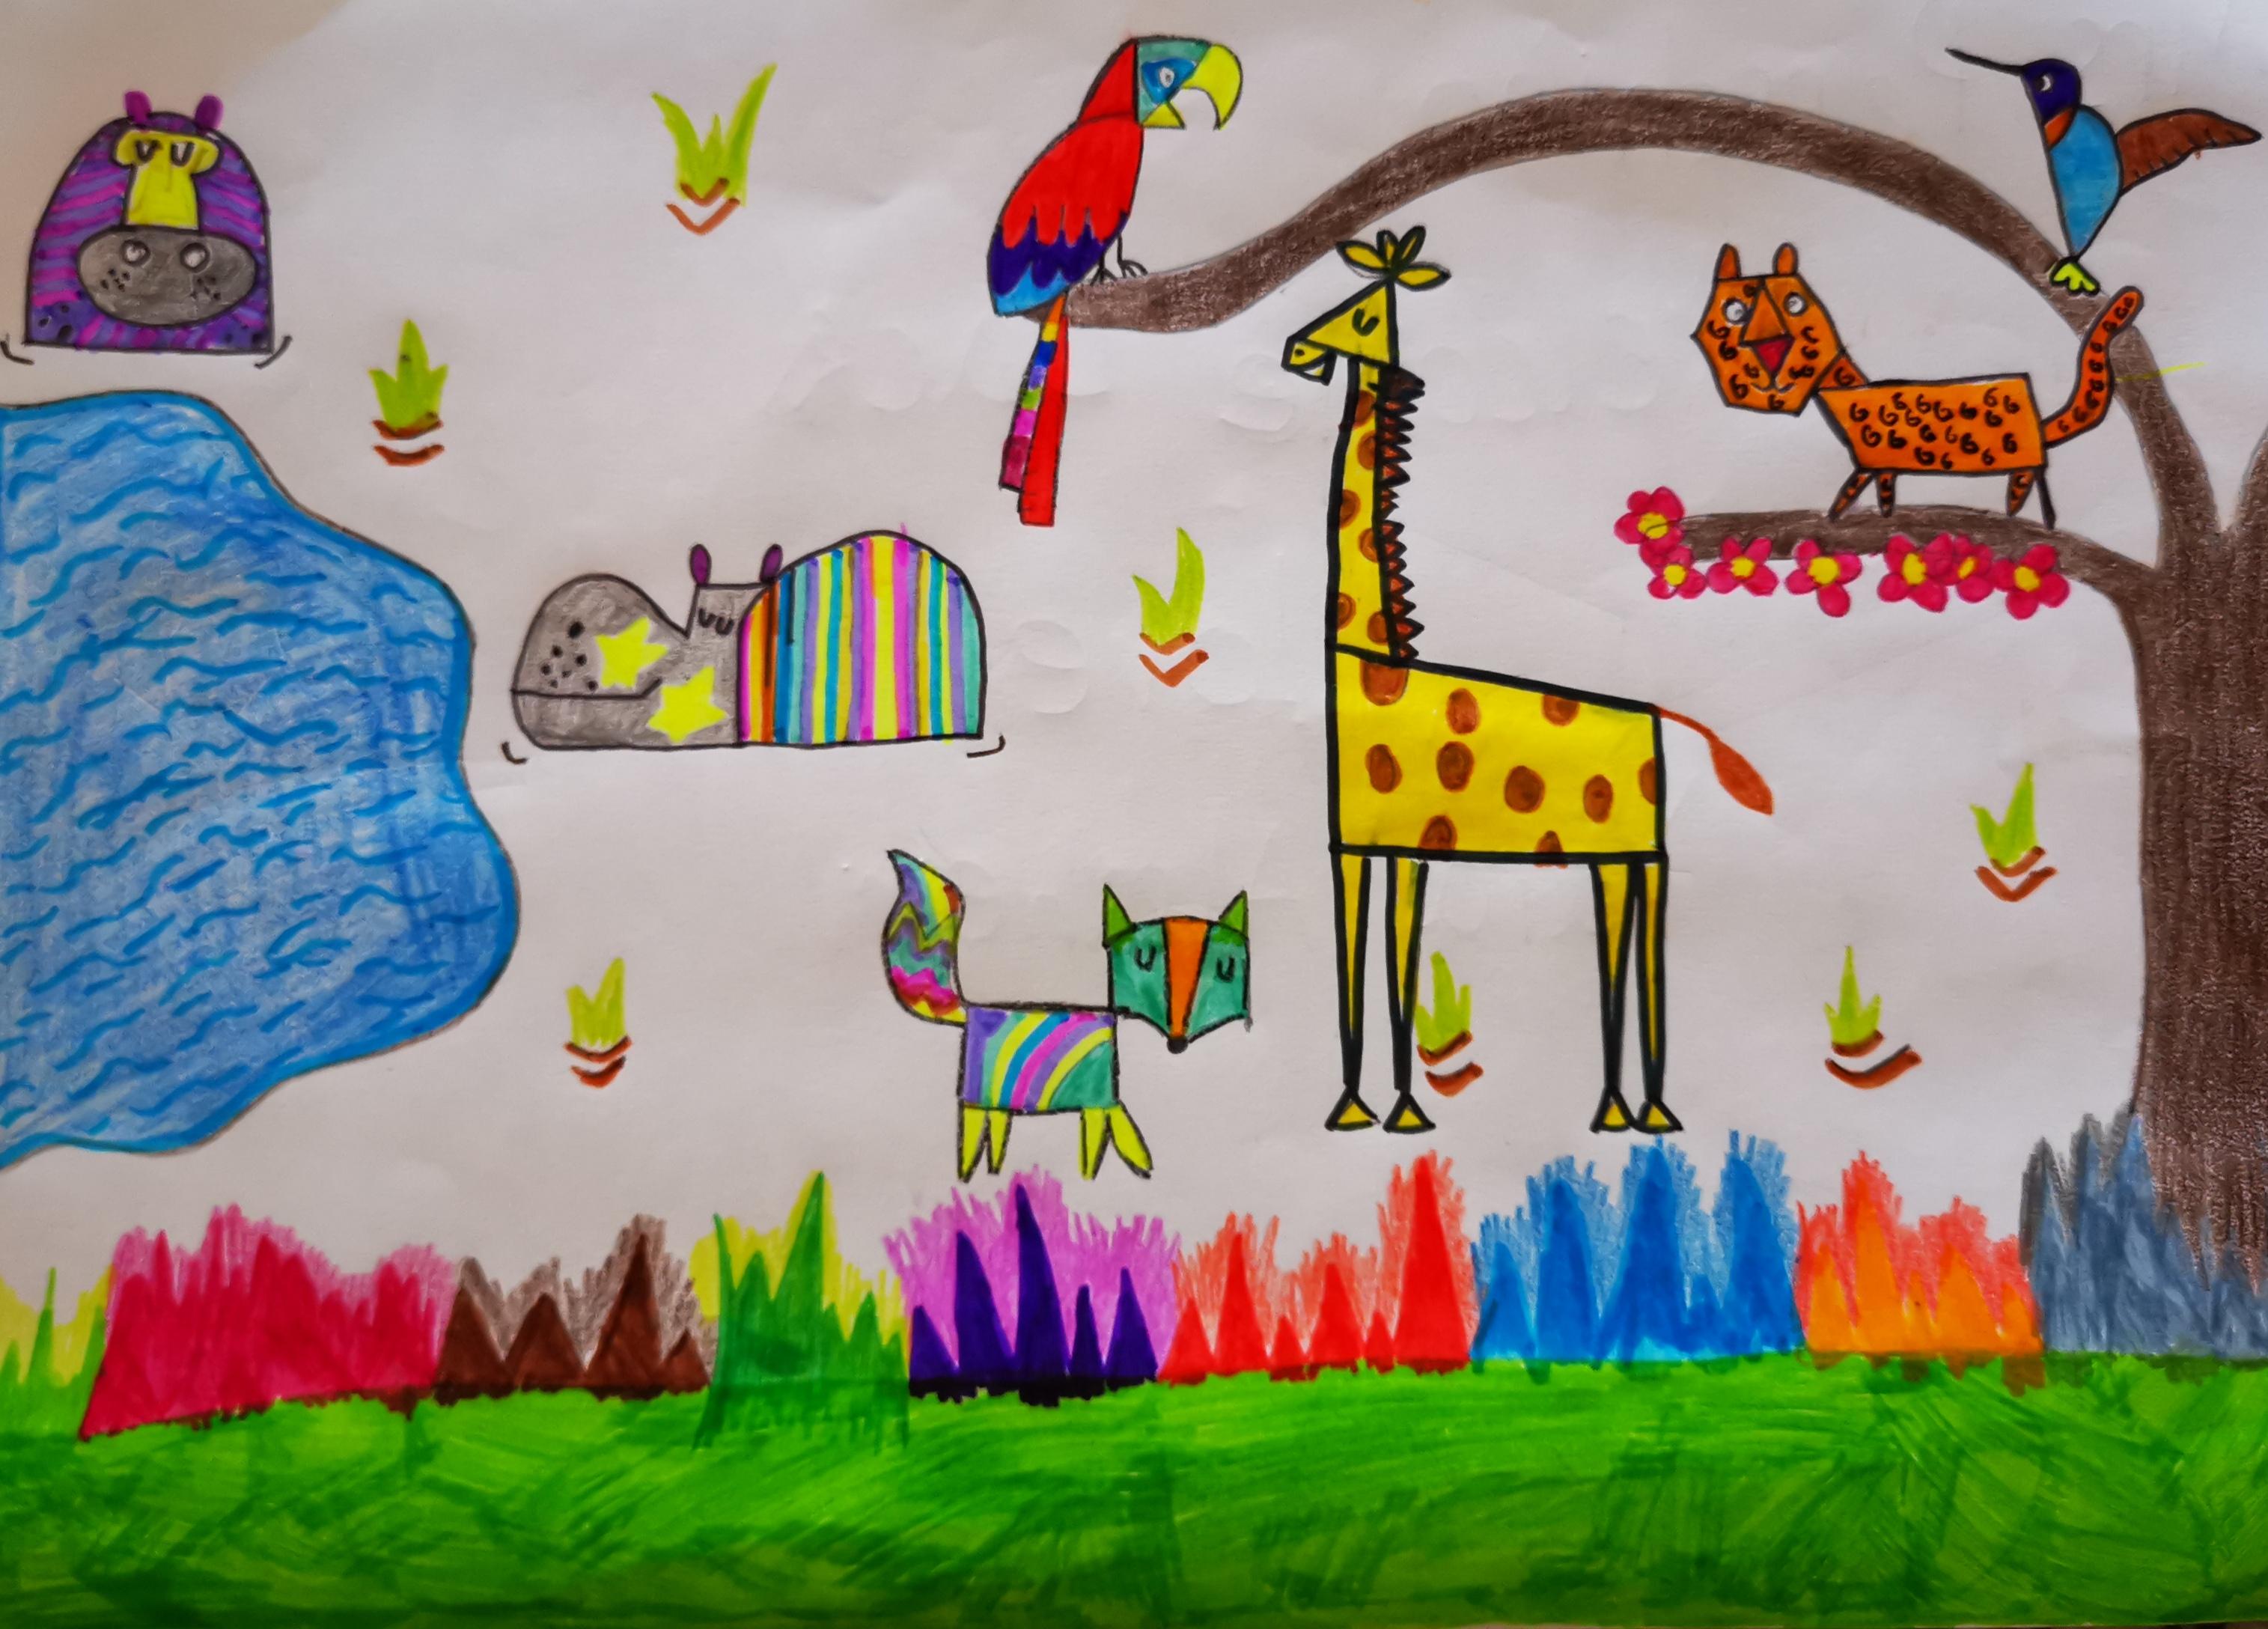 Animal Park Arabian Ranches by Yara Almheiri